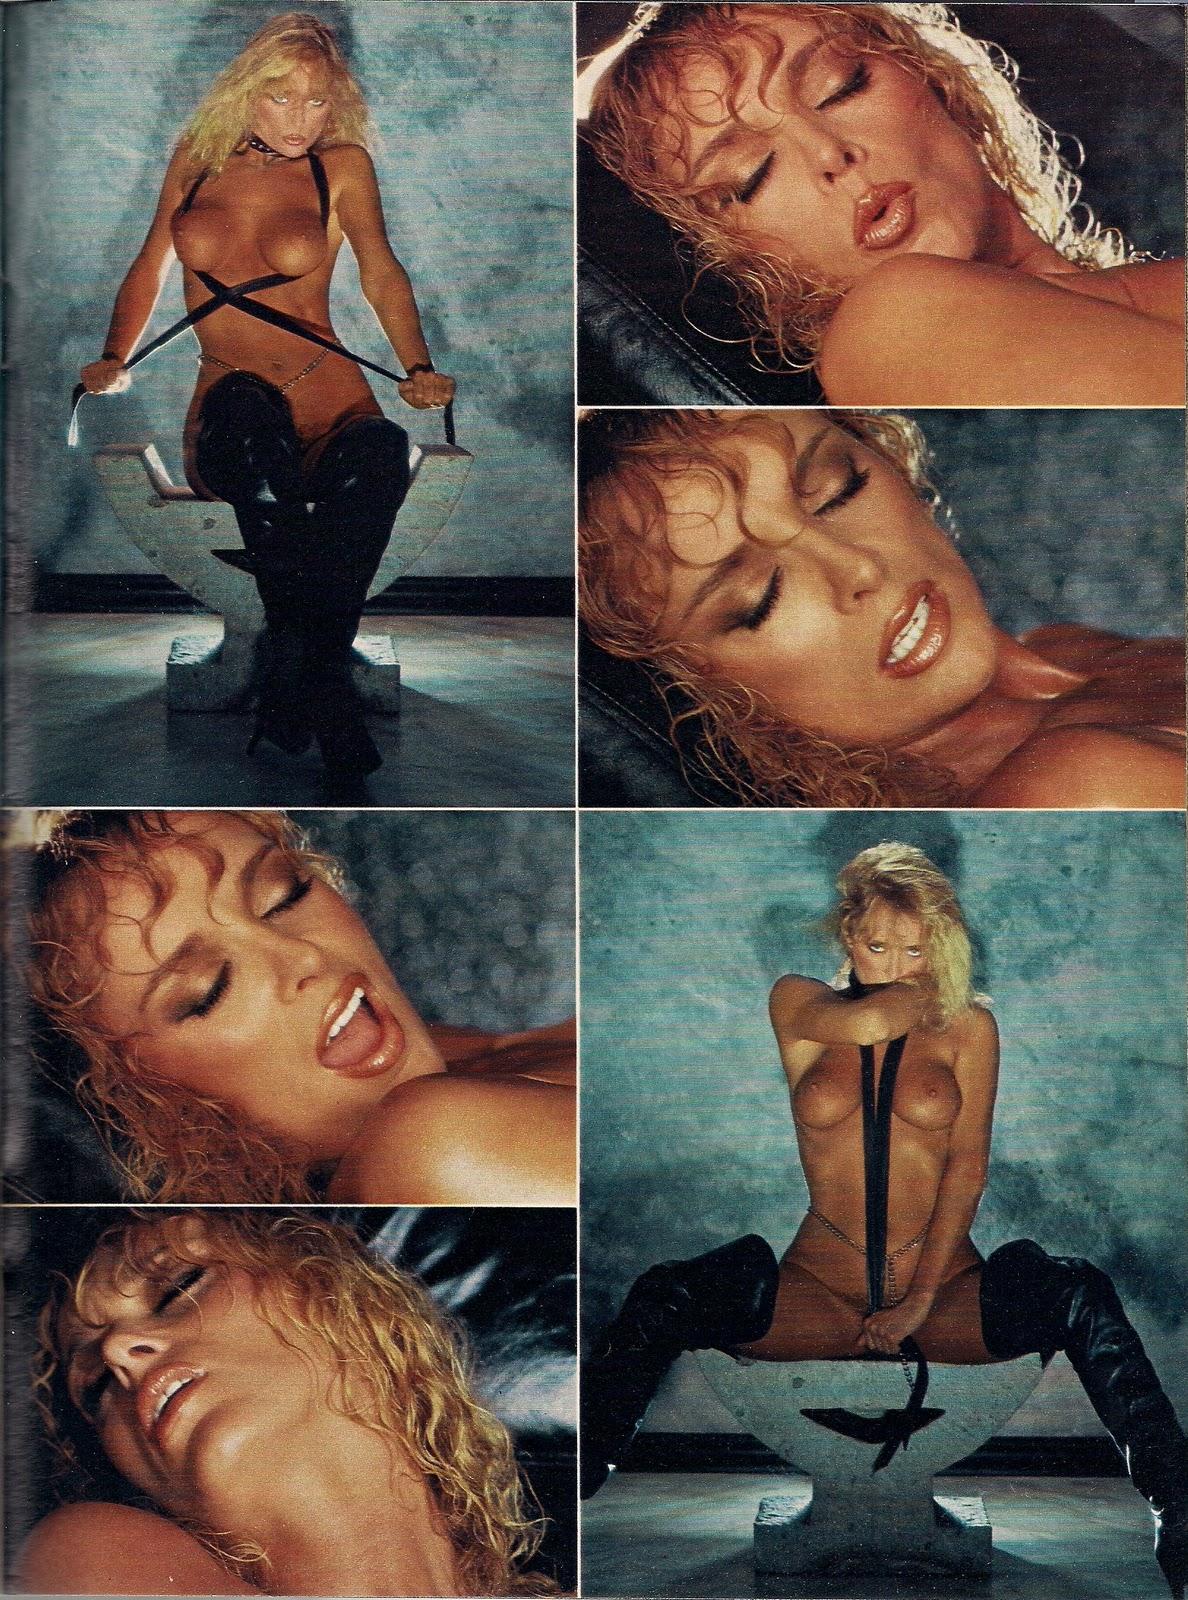 Sybil Danning Nude Playboy